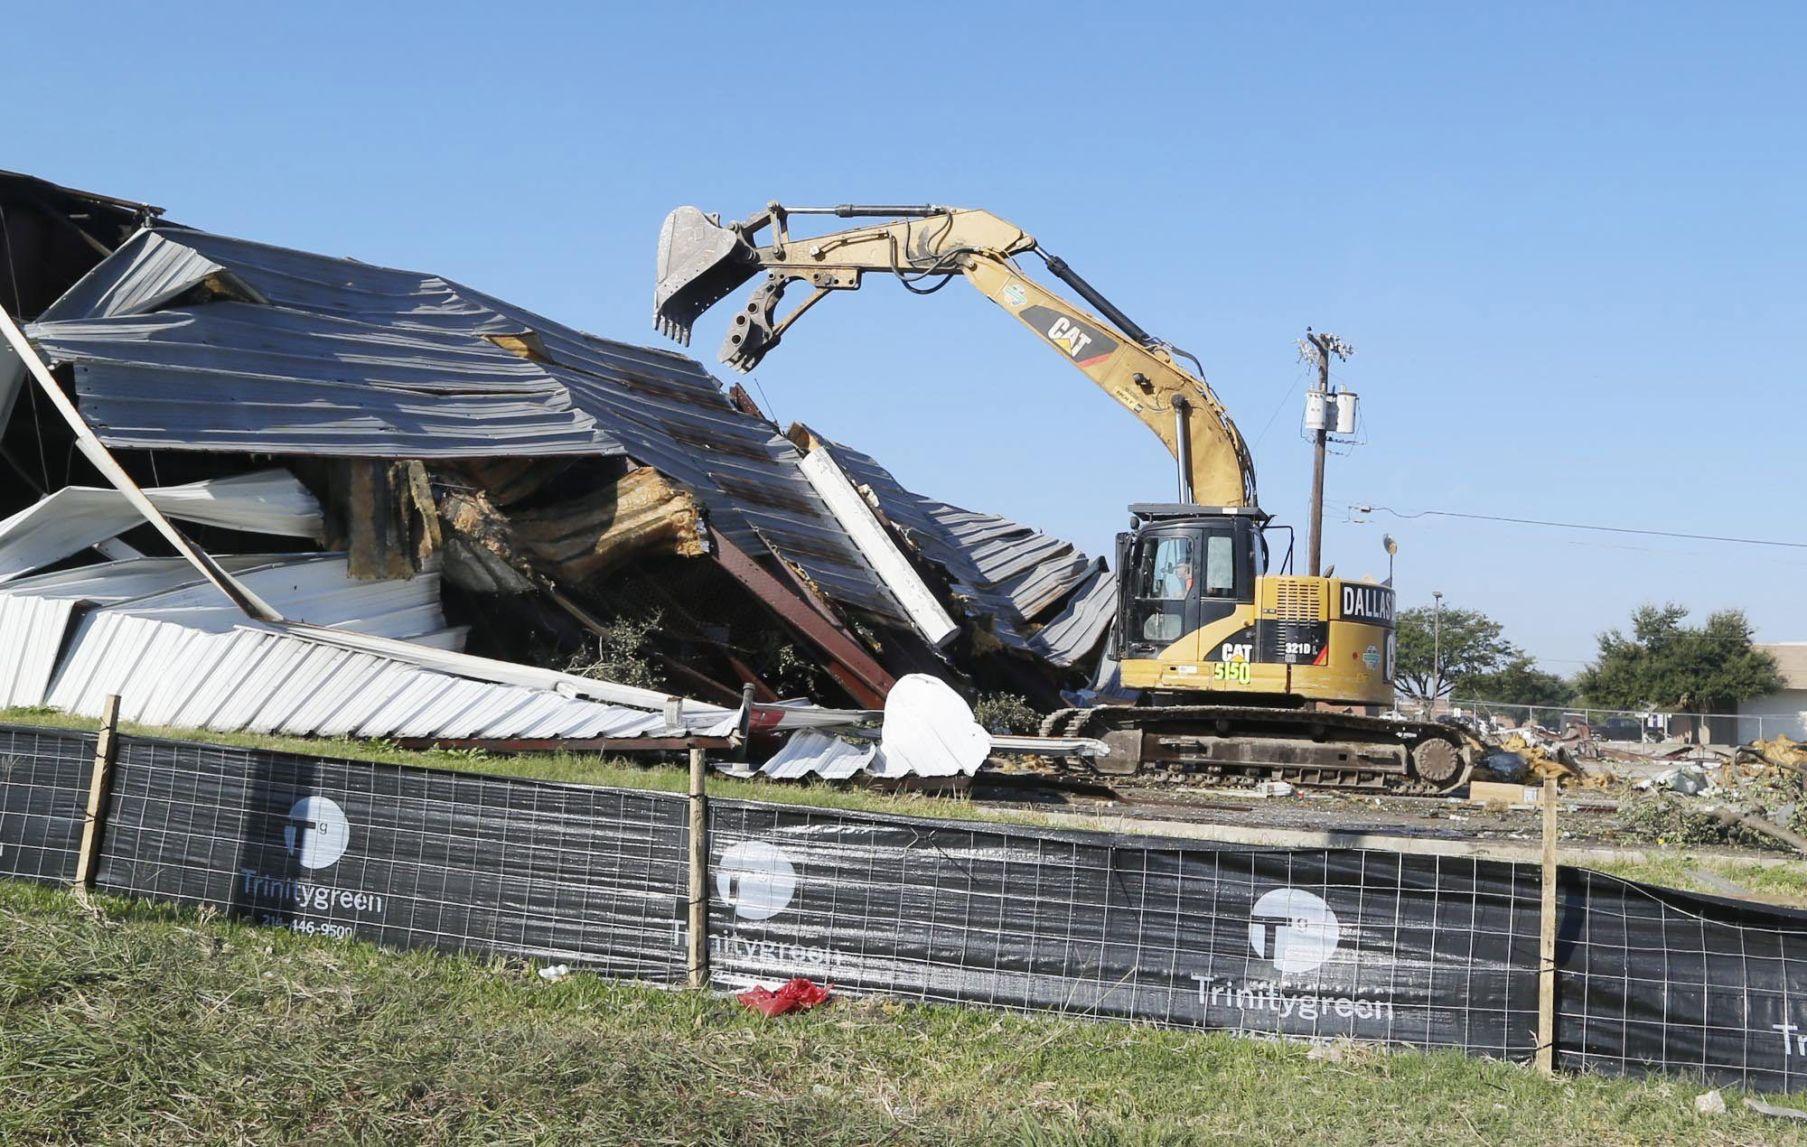 Karr motors site demolition begins on valley mills drive for Richard karr motors waco texas